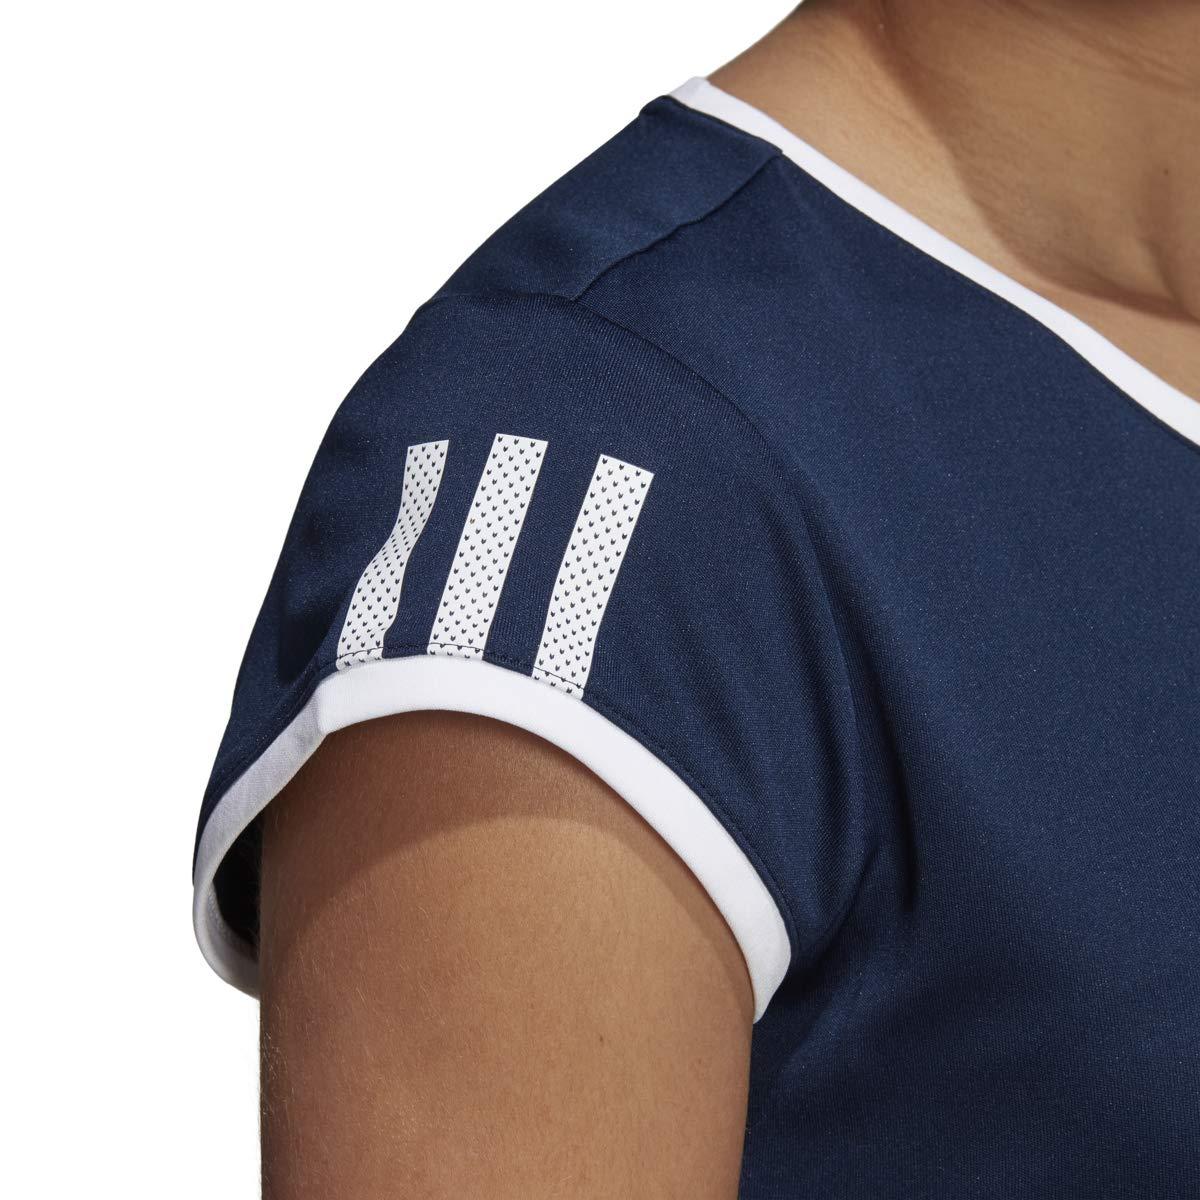 adidas Women's 3-Stripes Club Tennis Tee